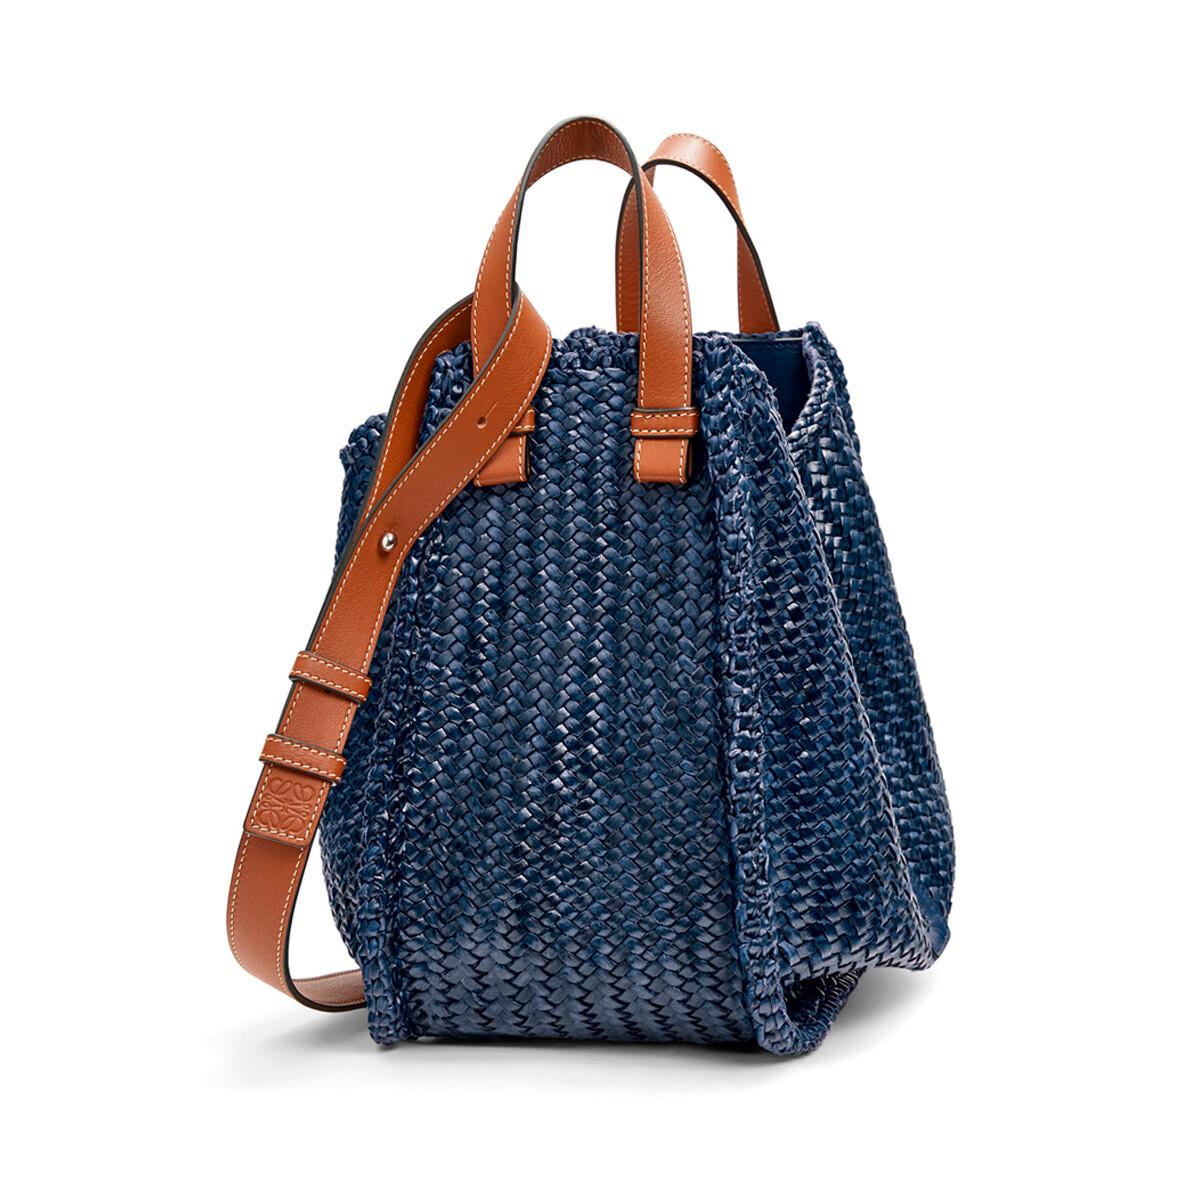 LOEWE Hammock Woven Medium Bag Navy Blue front